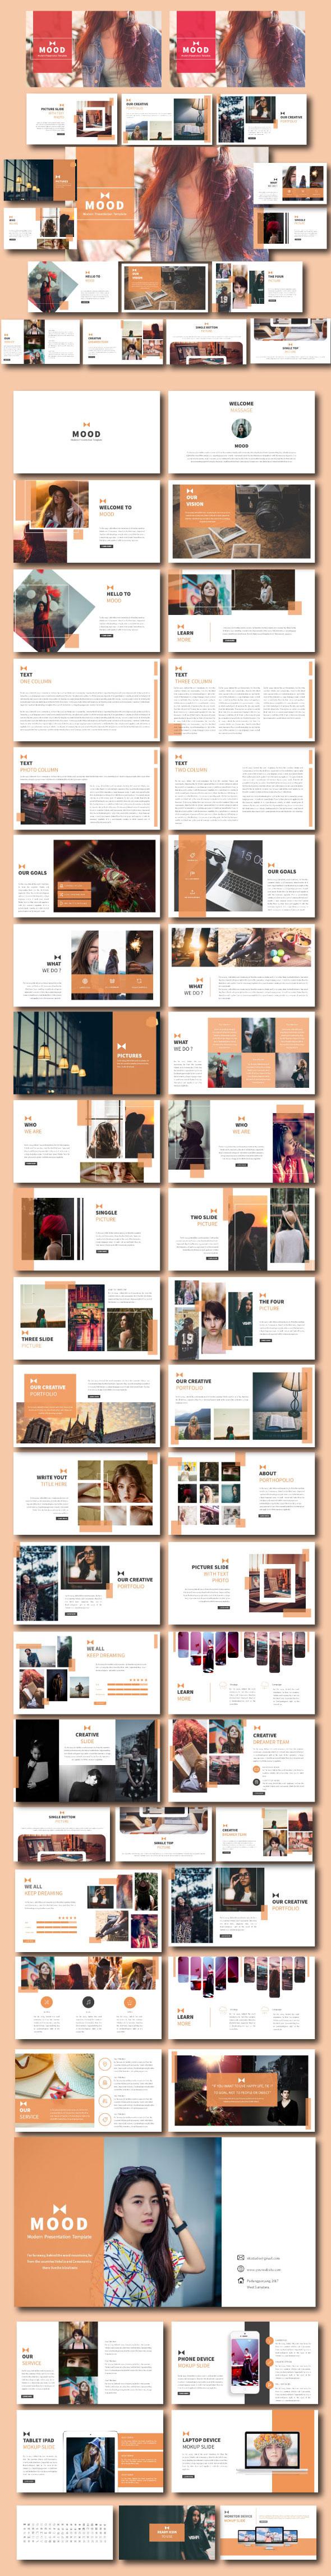 Mood Creative Presentation - Creative PowerPoint Templates